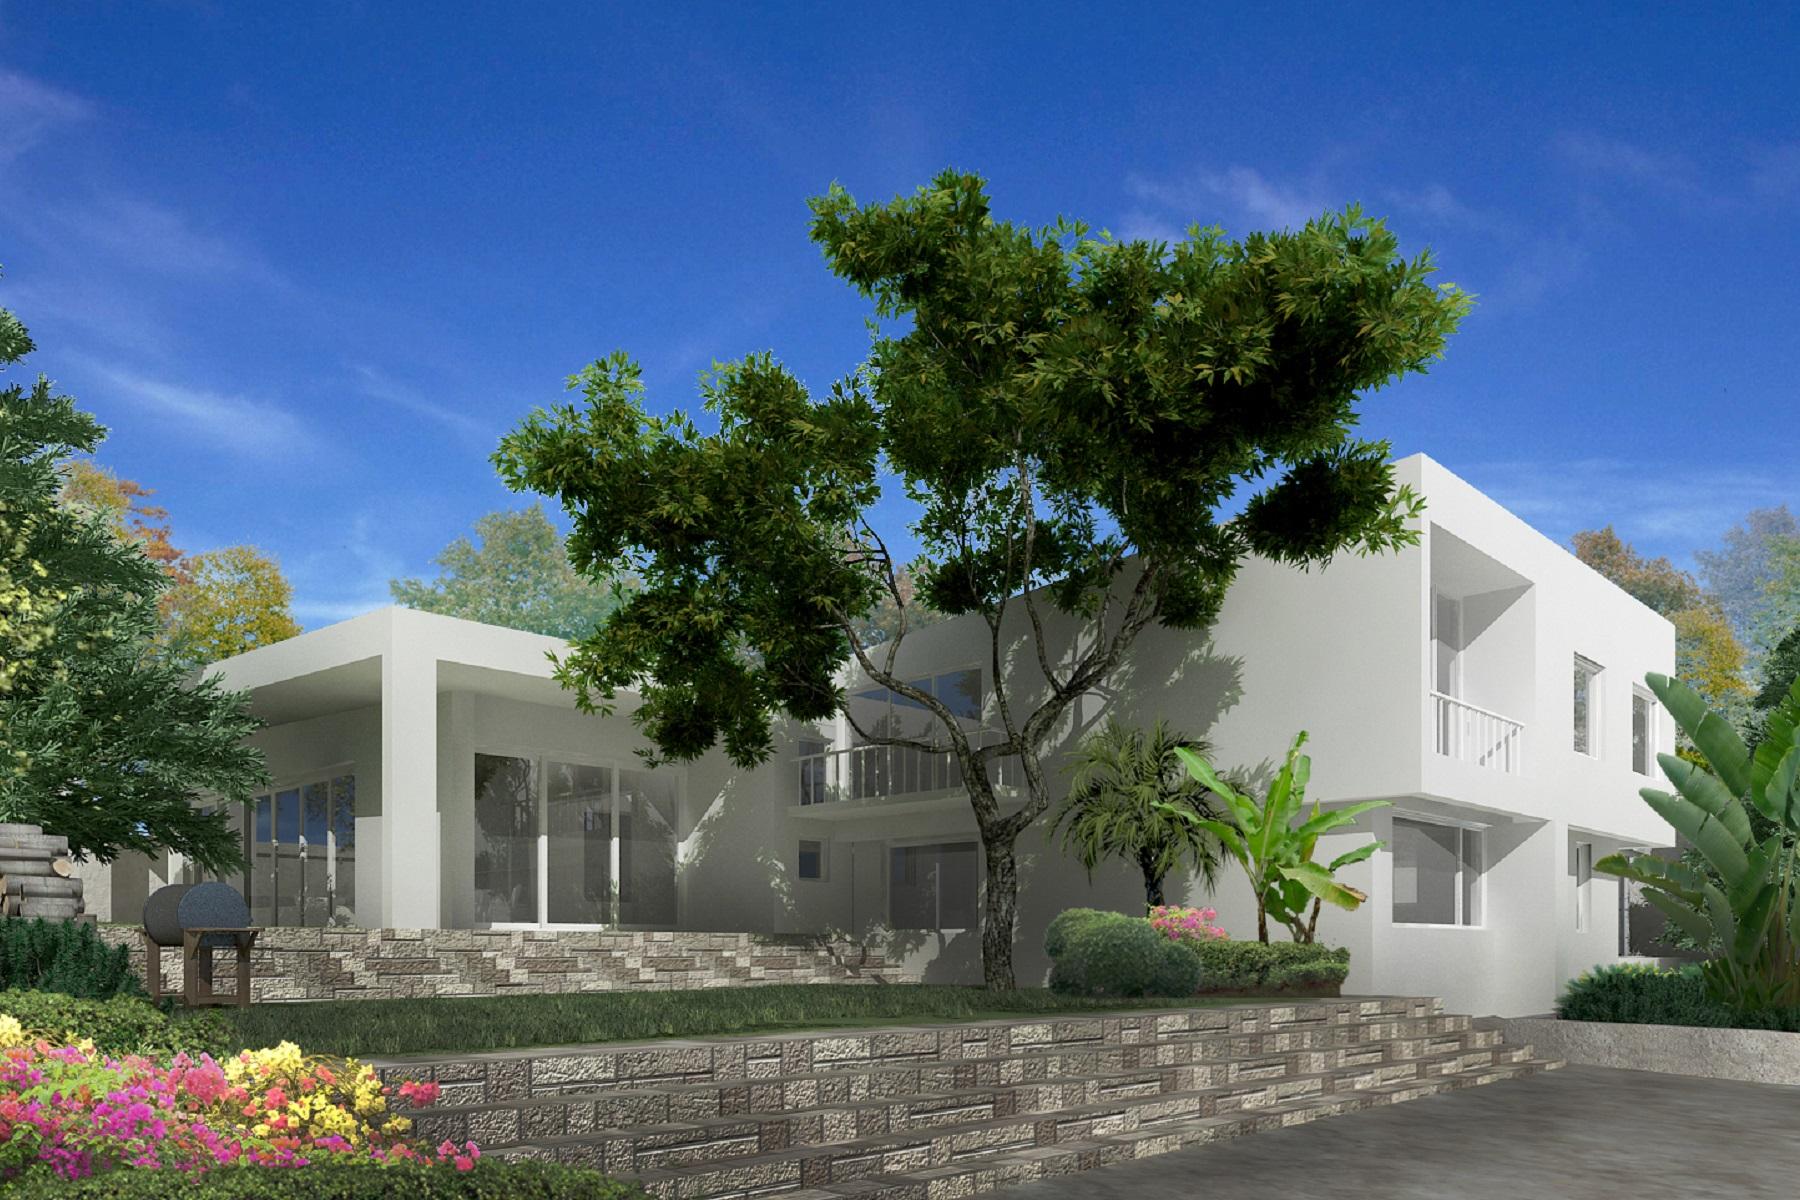 Single Family Homes for Sale at Villa Neo-Beauté Zhongyong 1st Rd., Shilin Dist. Taipei City, Taiwan 111 Taiwan